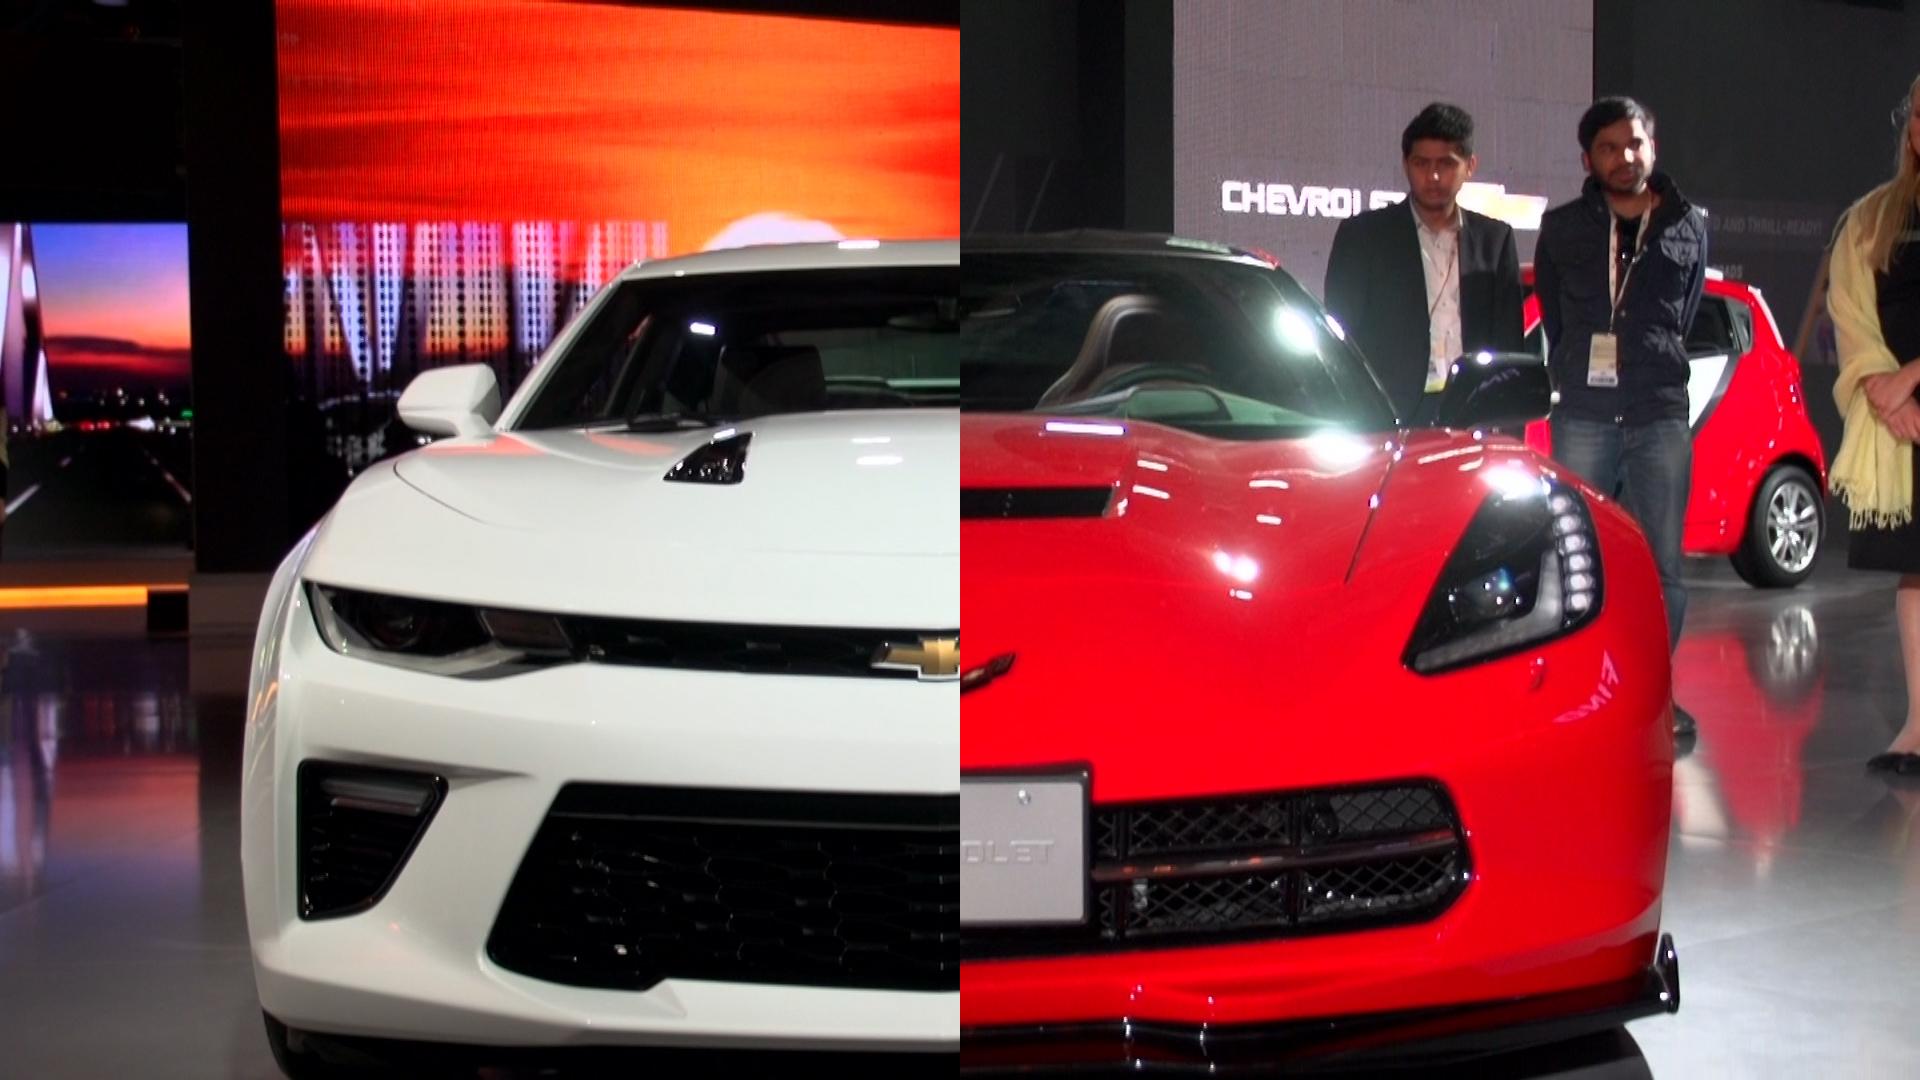 Chevrolet Camaro Vs Corvette Sringray on 2016 Camaro Ss Vs Mustang Gt